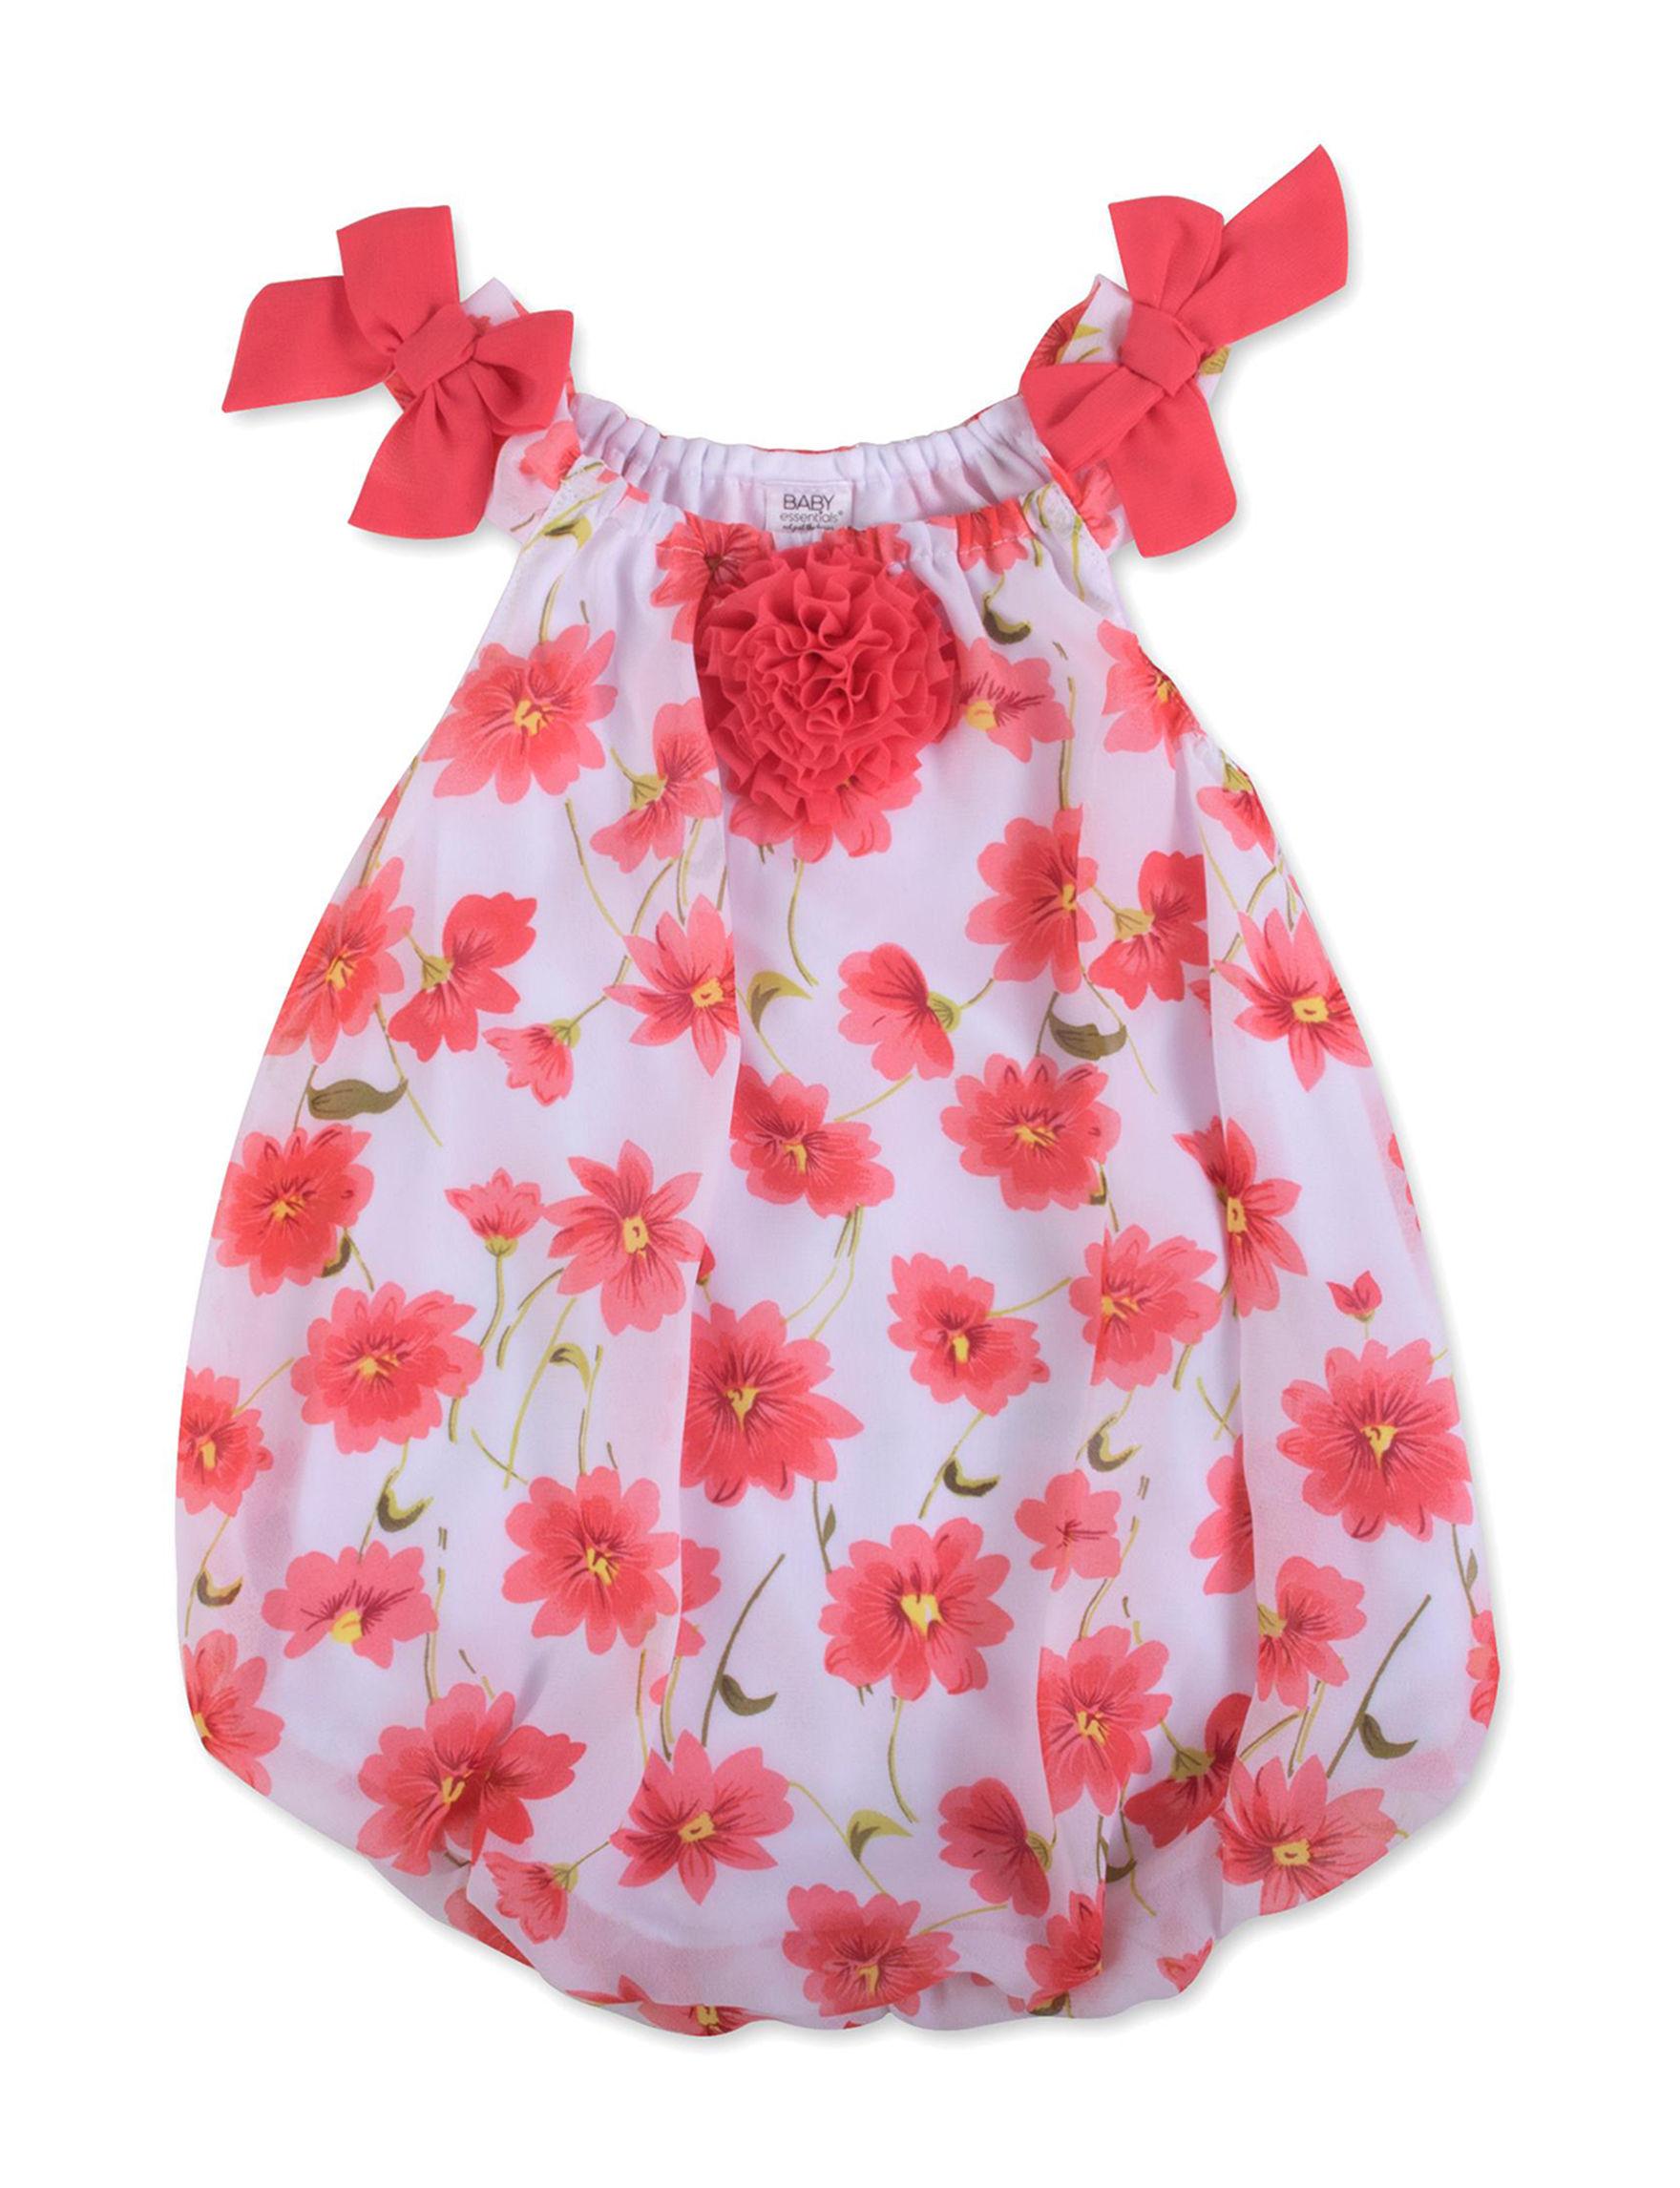 Baby Essentials Coral / White